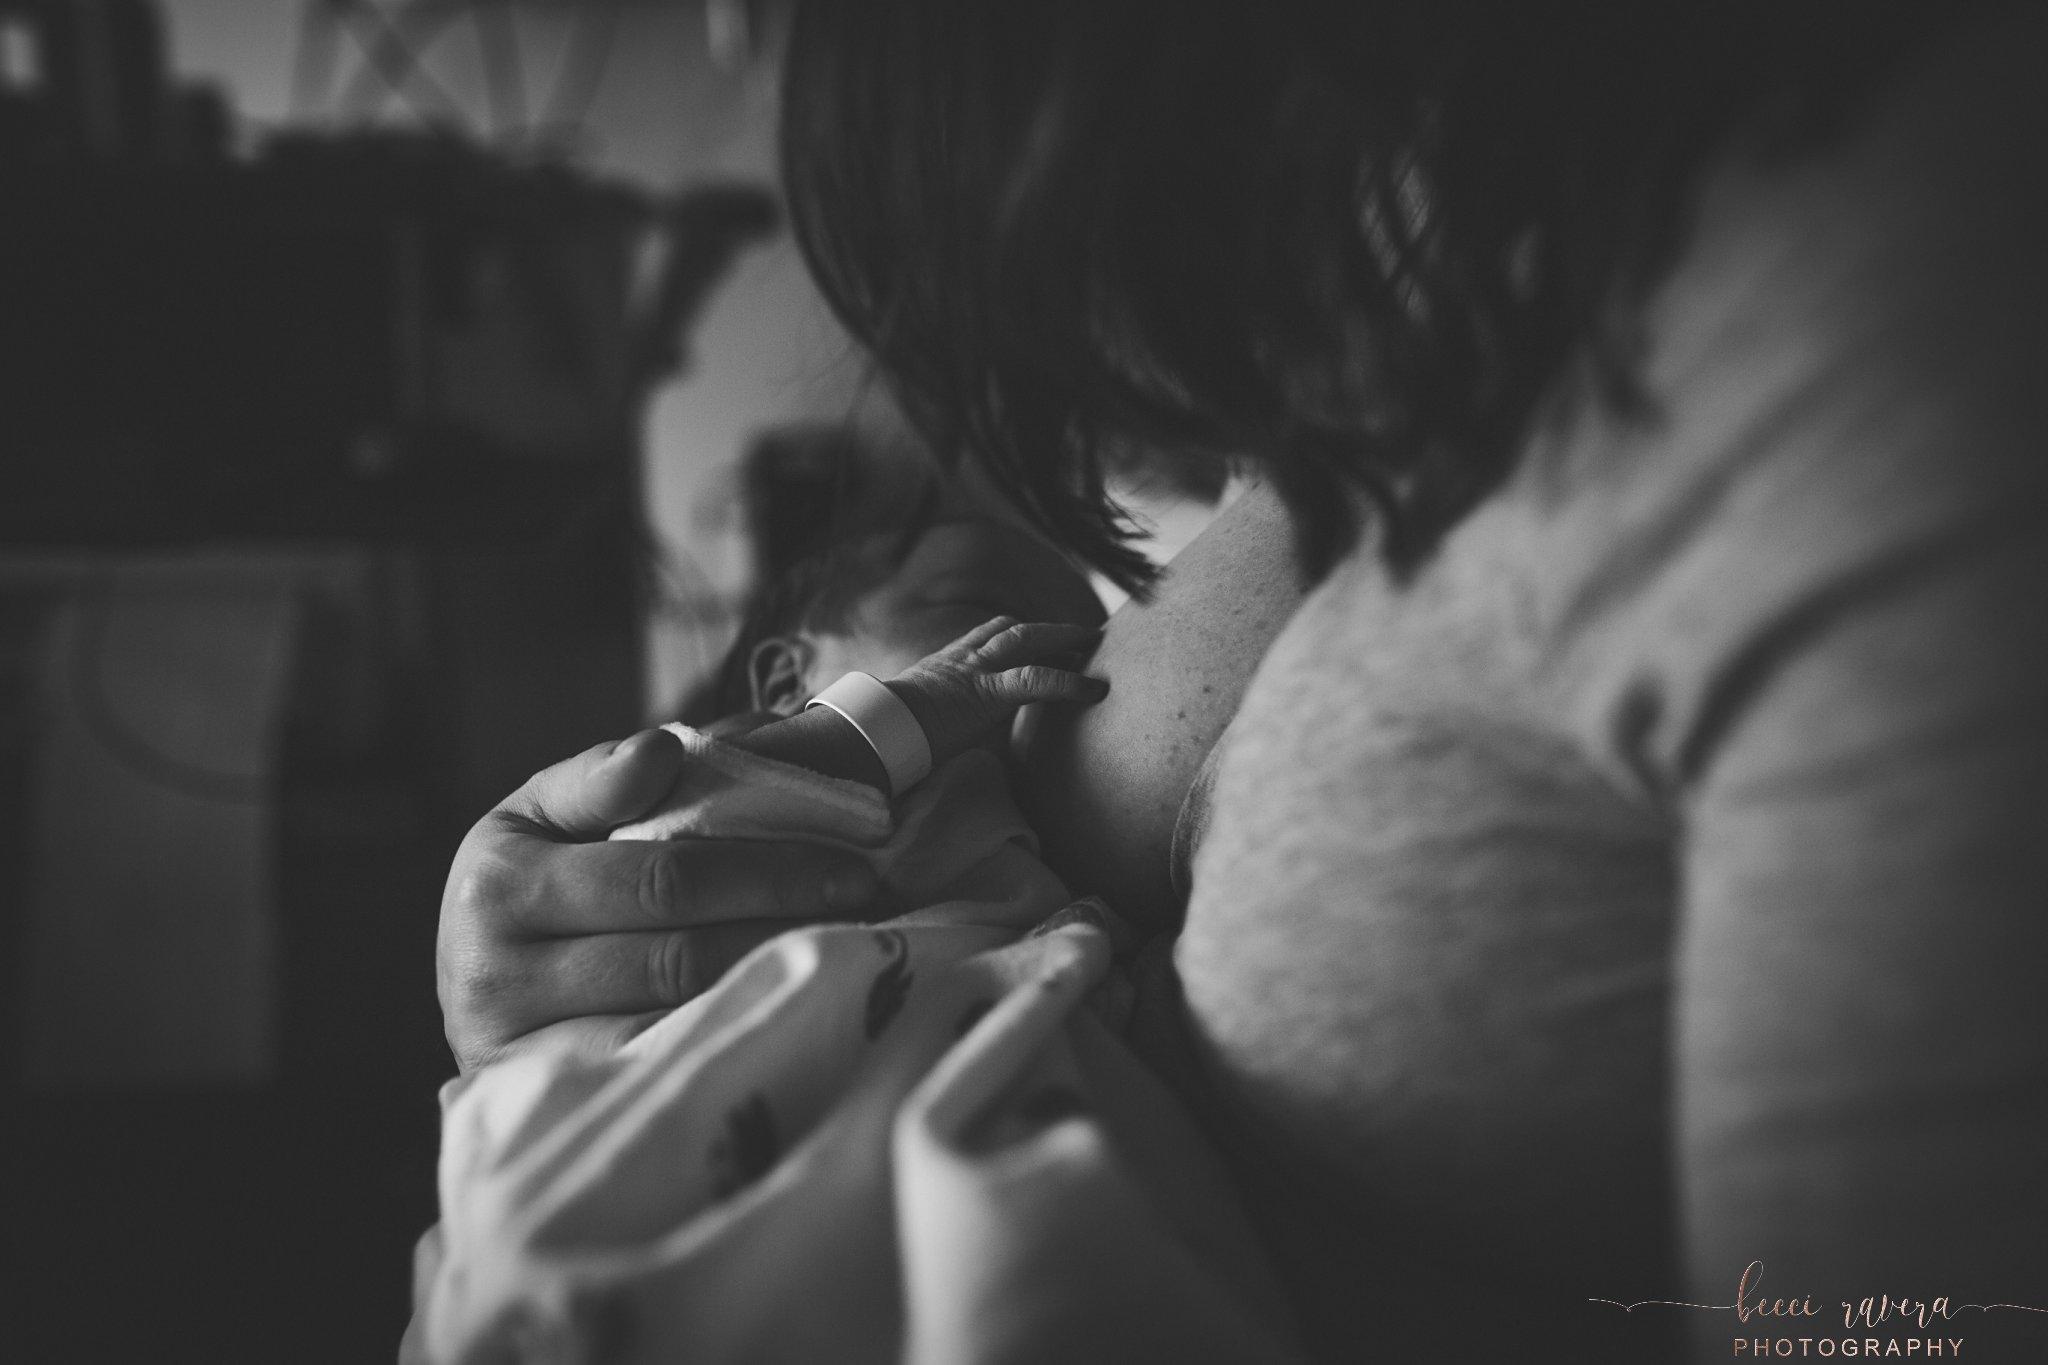 Becci Ravera Photography | Roseville Sacramento and Northern CA Photographer | Family and Newborn Lifestyle Photographer